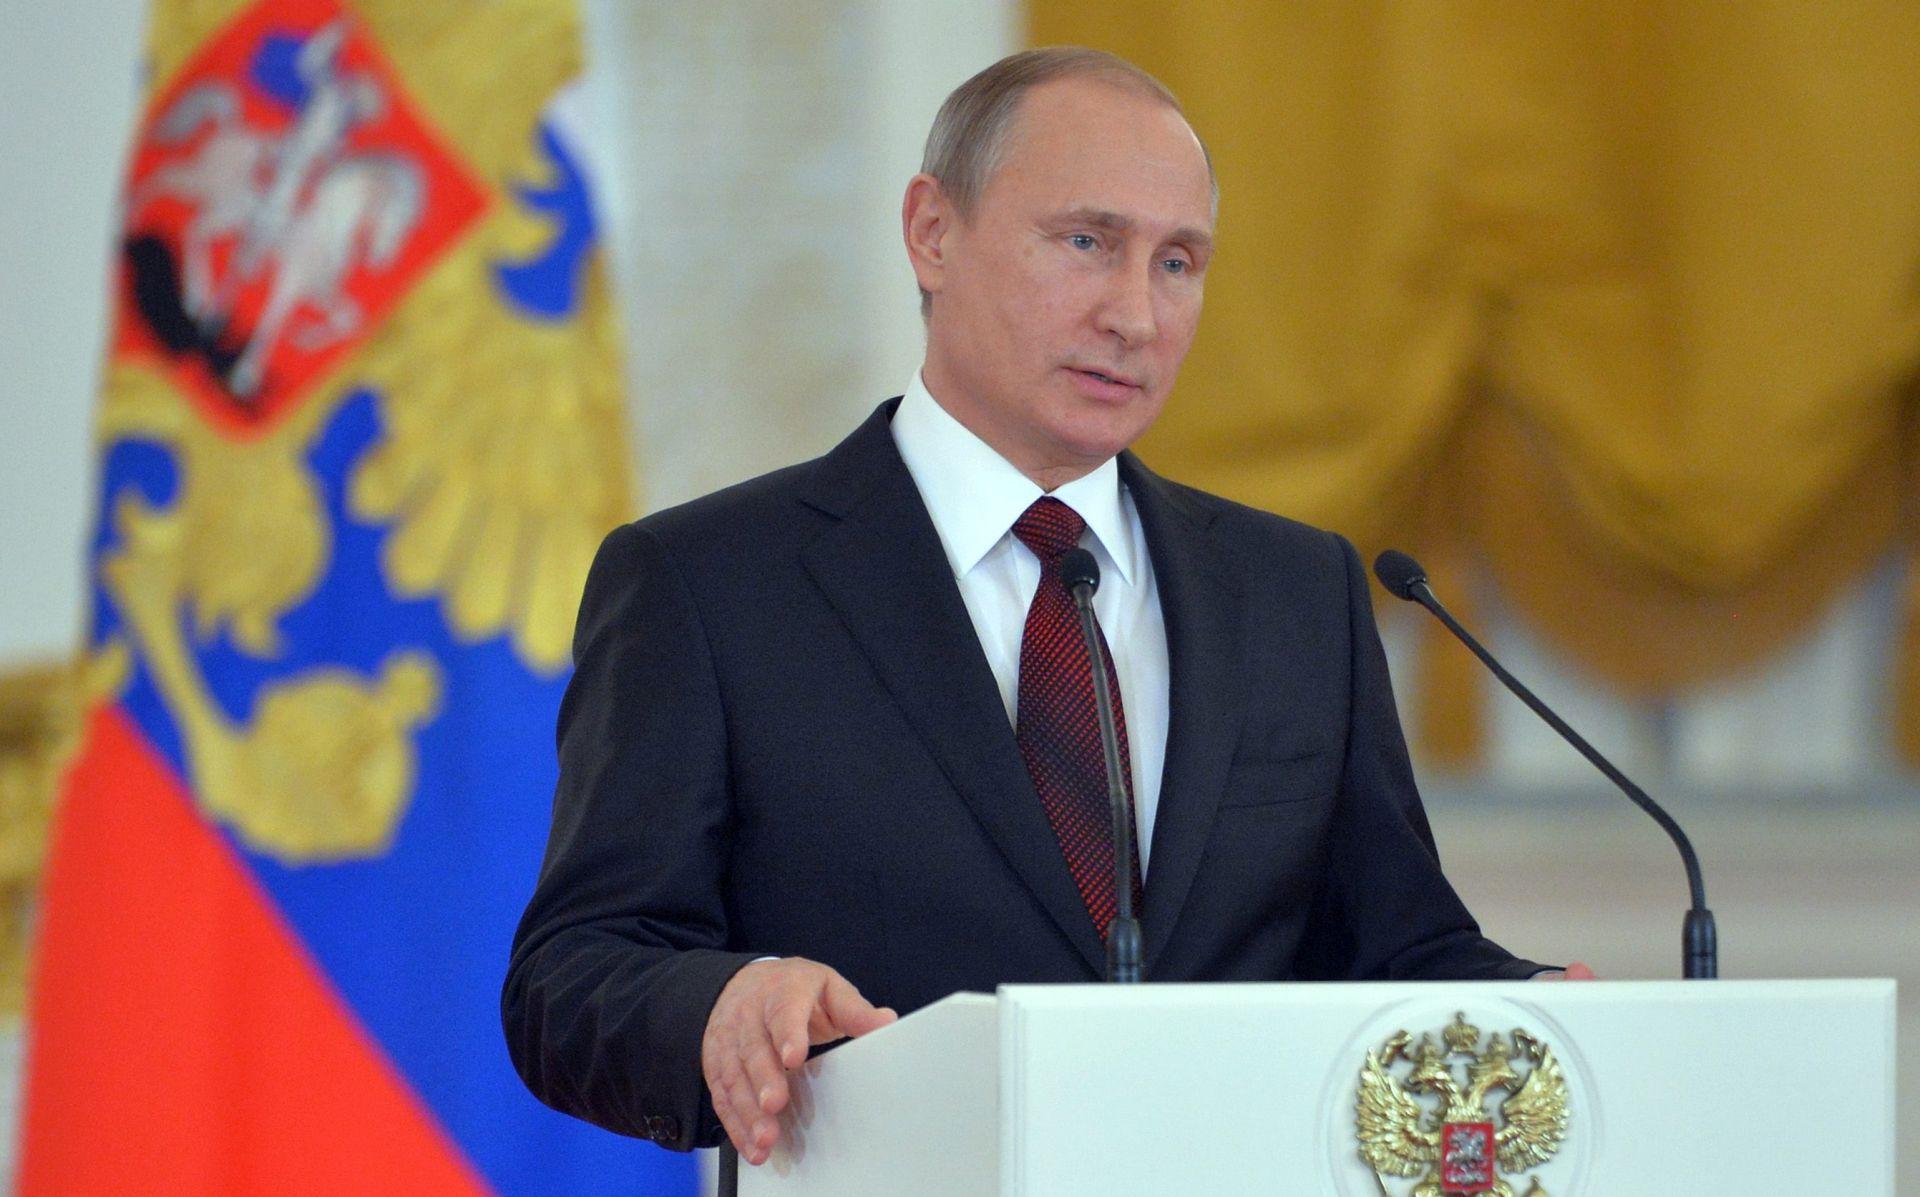 POSTAVLJENA BOMBA? Rusija obustavila sve letove za Egipat